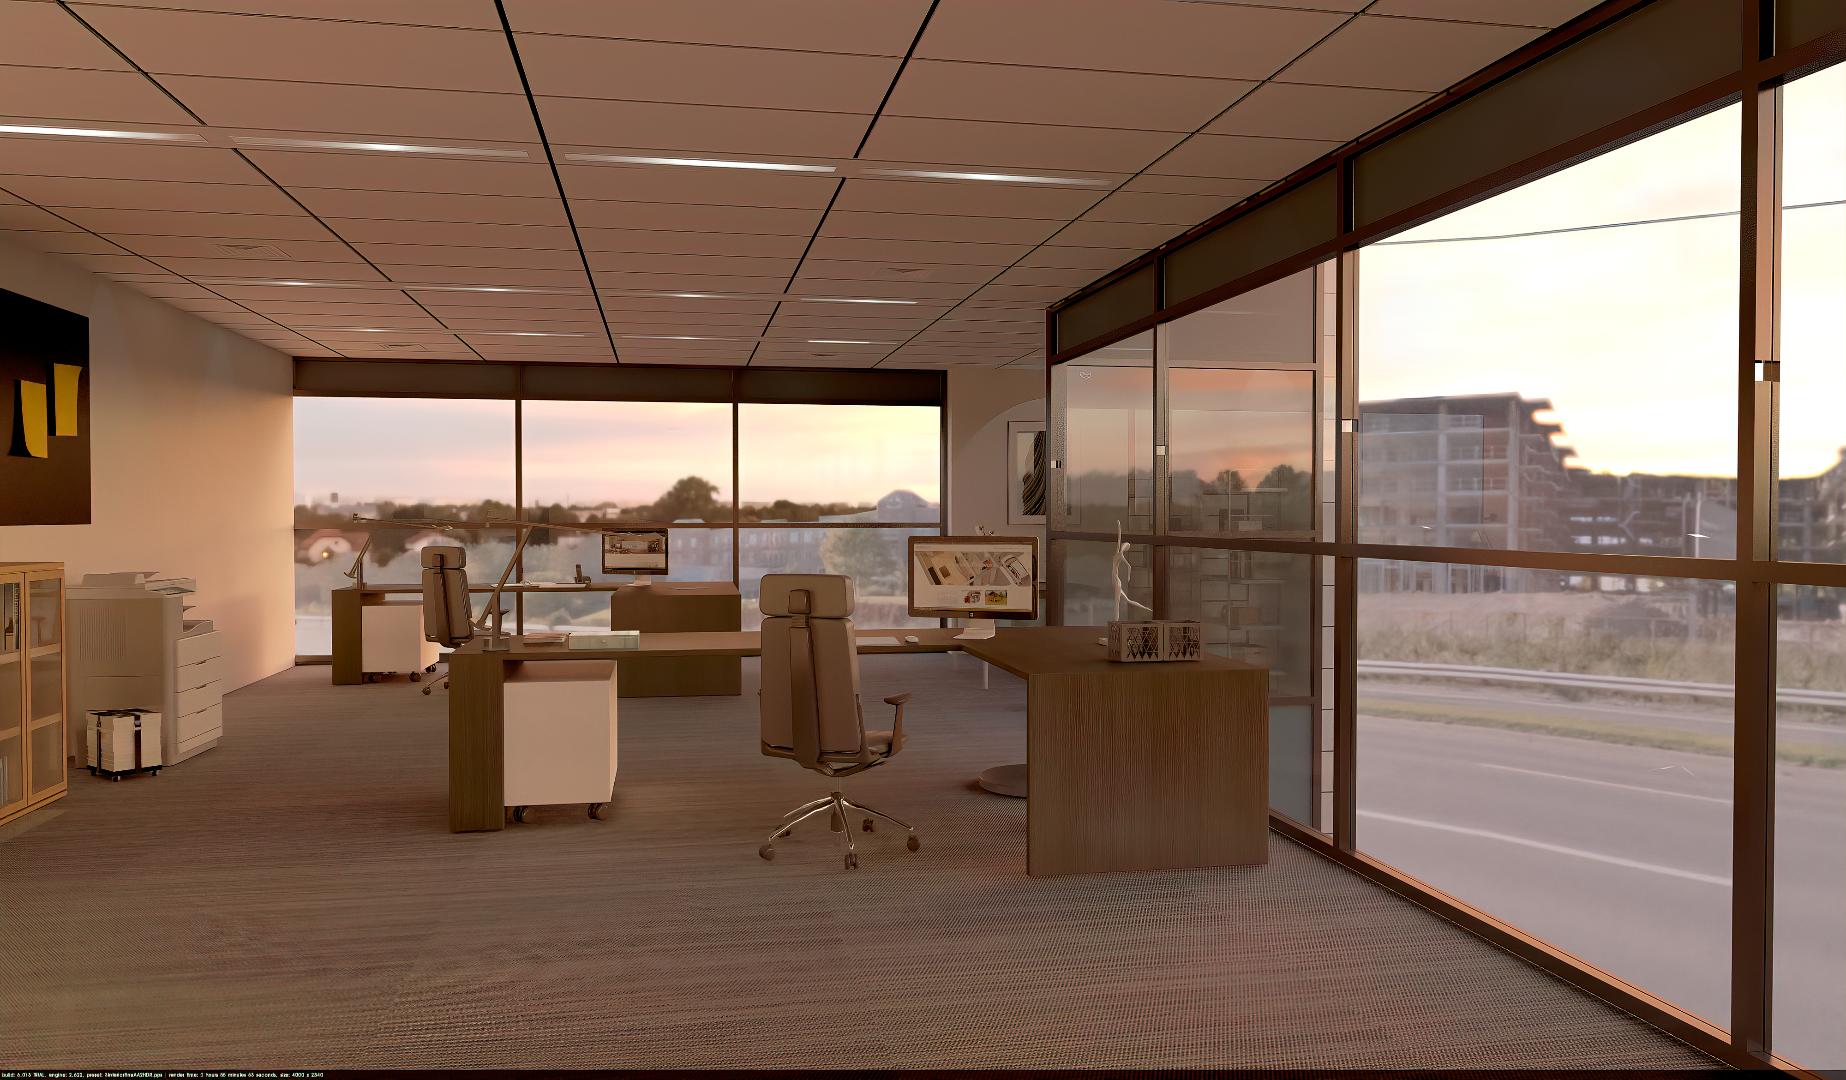 Interieur-office-v6 2018-no-hidden-lem2-Edit.png